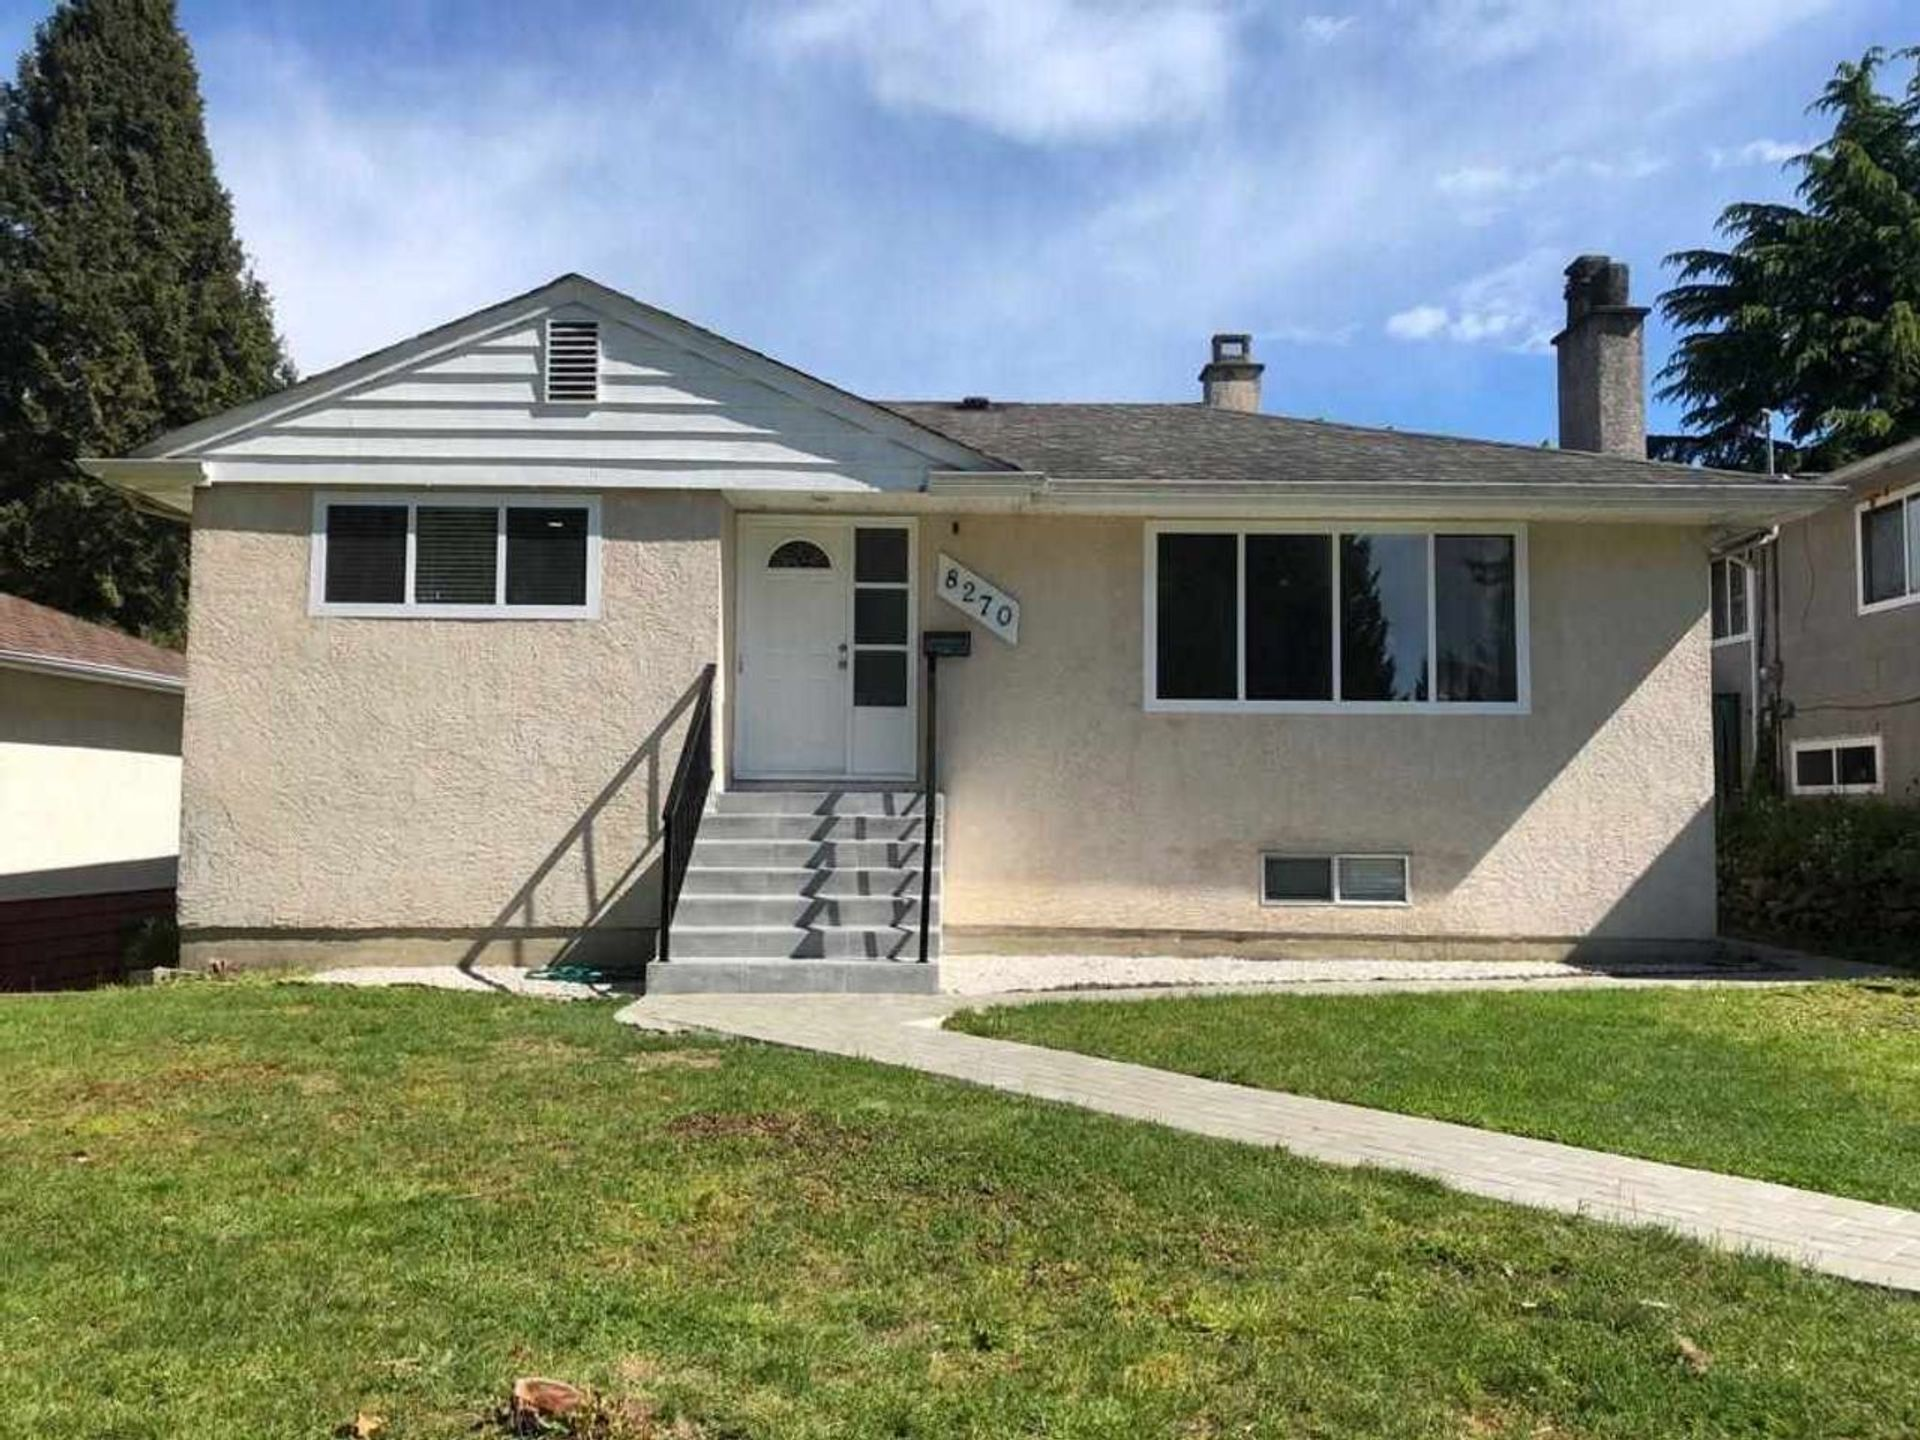 8270 Wedgewood Street, Burnaby Lake, Burnaby South